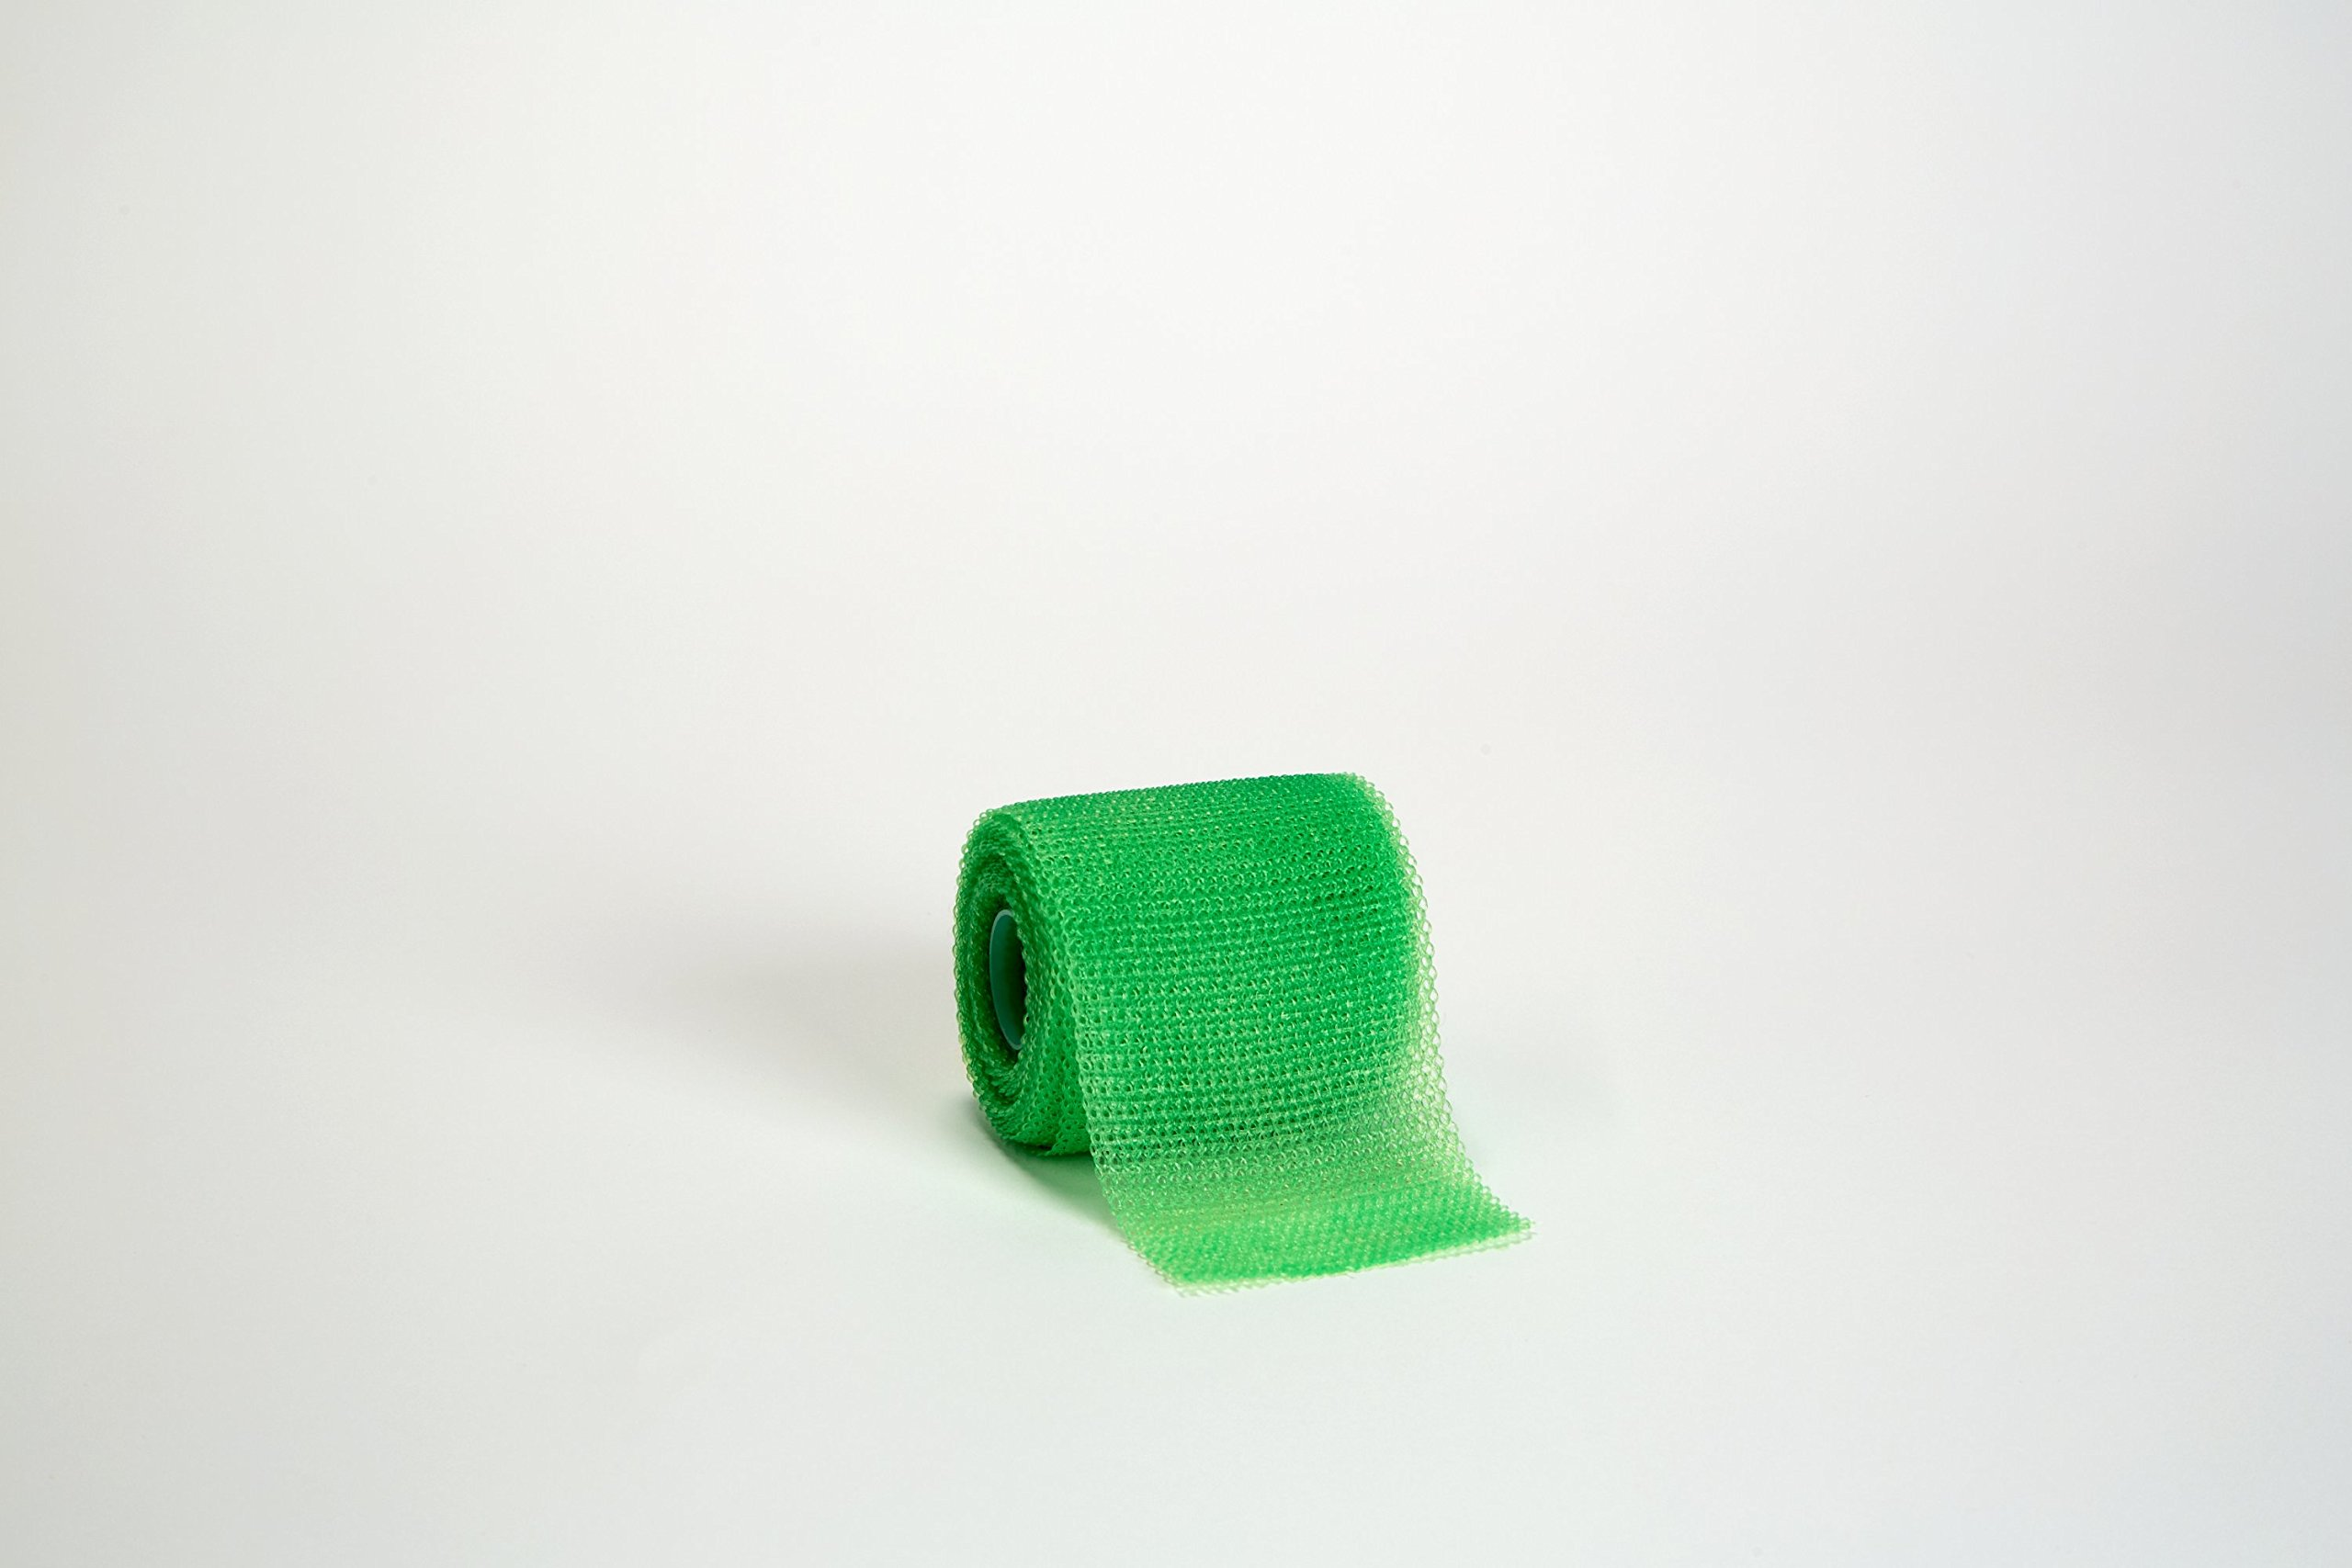 3M Scotchcast 82002V Plus Casting Tape, Bright Green 2'' x 4 Yard (Pack of 10)